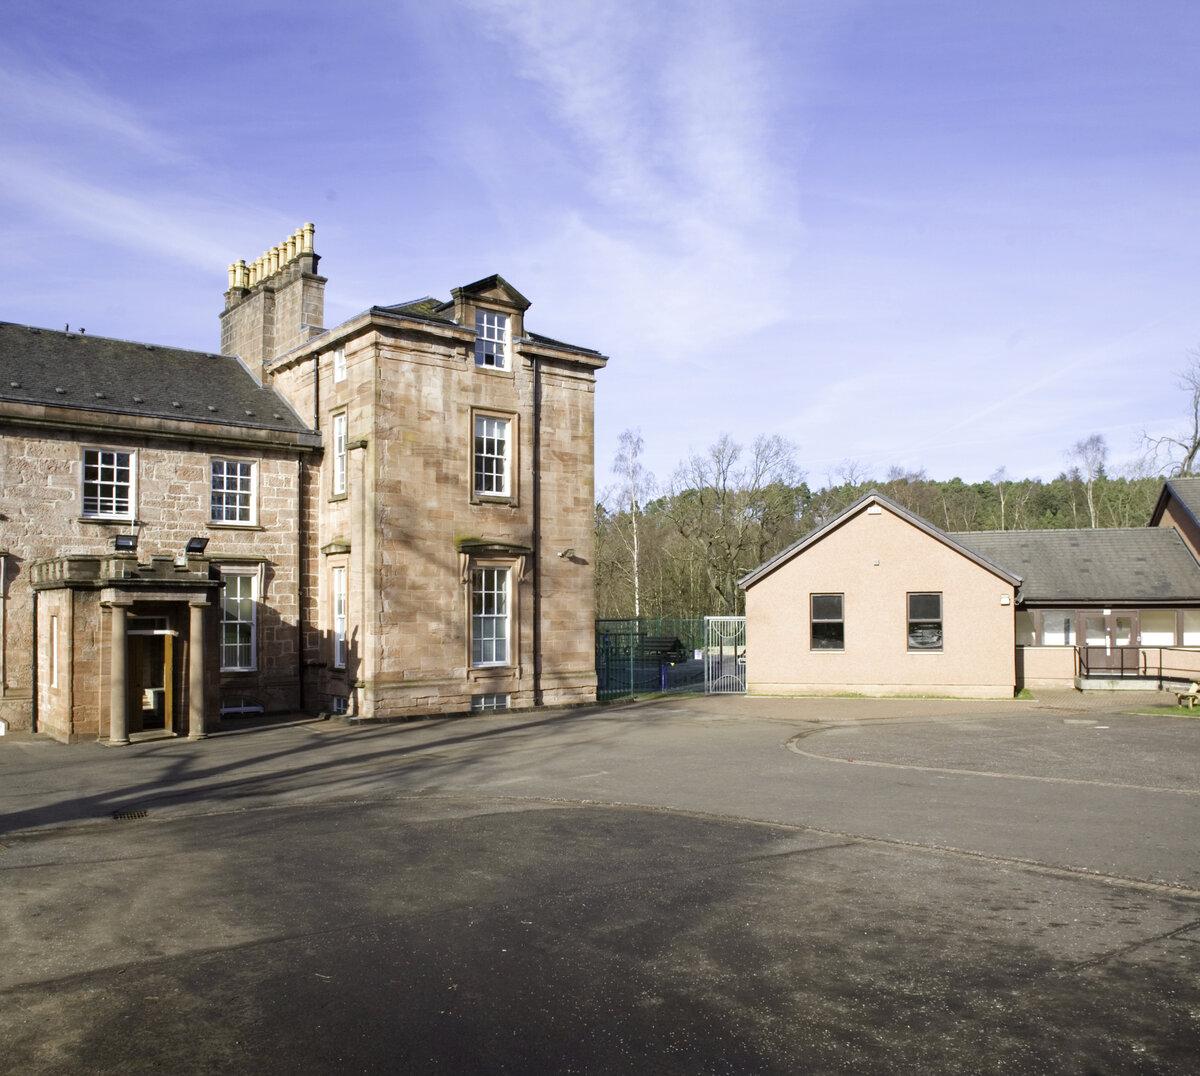 Daldorch House School, Sorn Road, Catrine, Ayrshire KA5 6NA 15/02/08 NAS